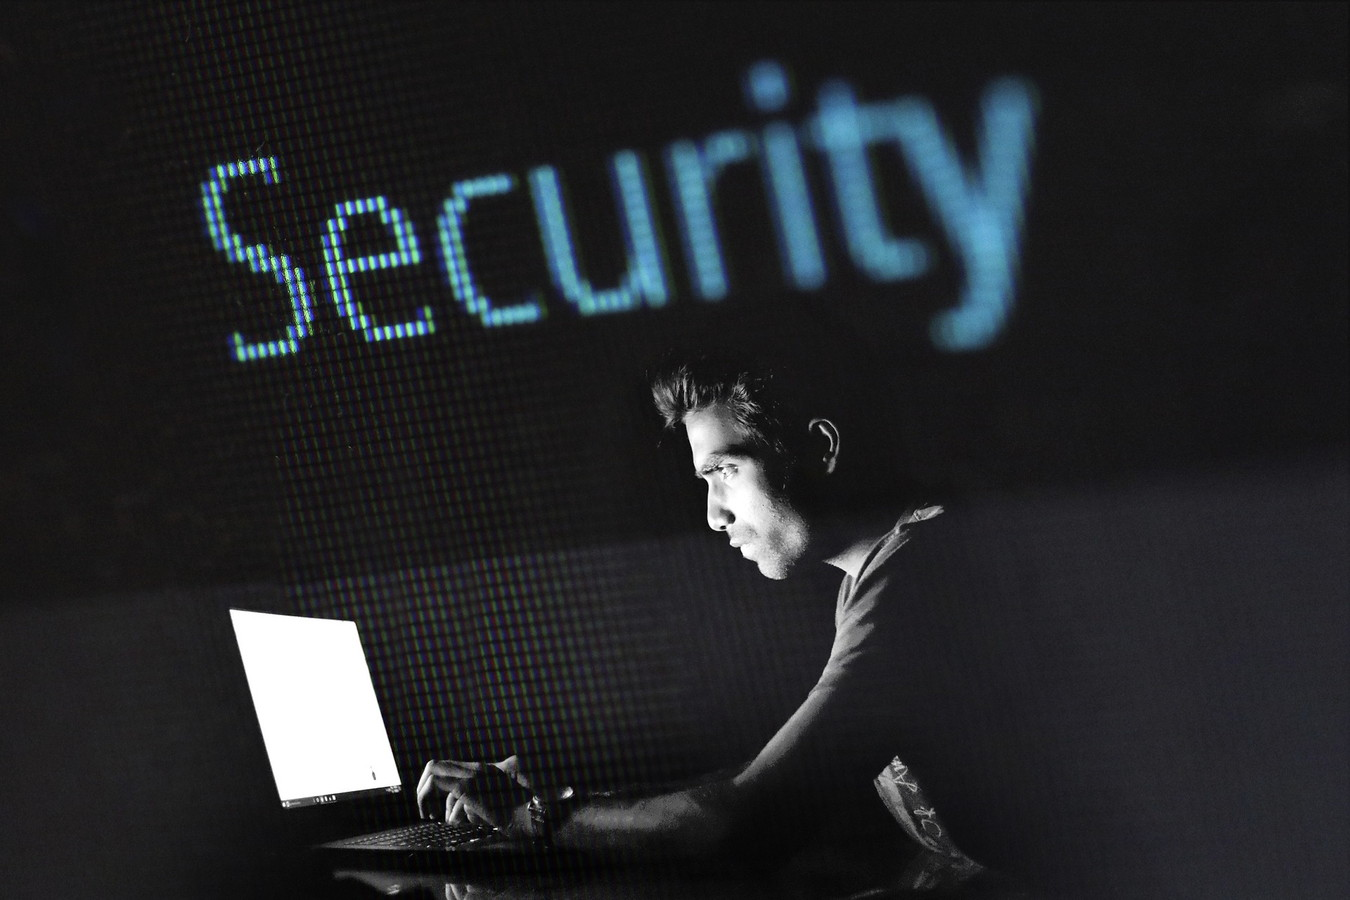 【WIndows10】常に意識しておきたい8つのセキュリティ対策